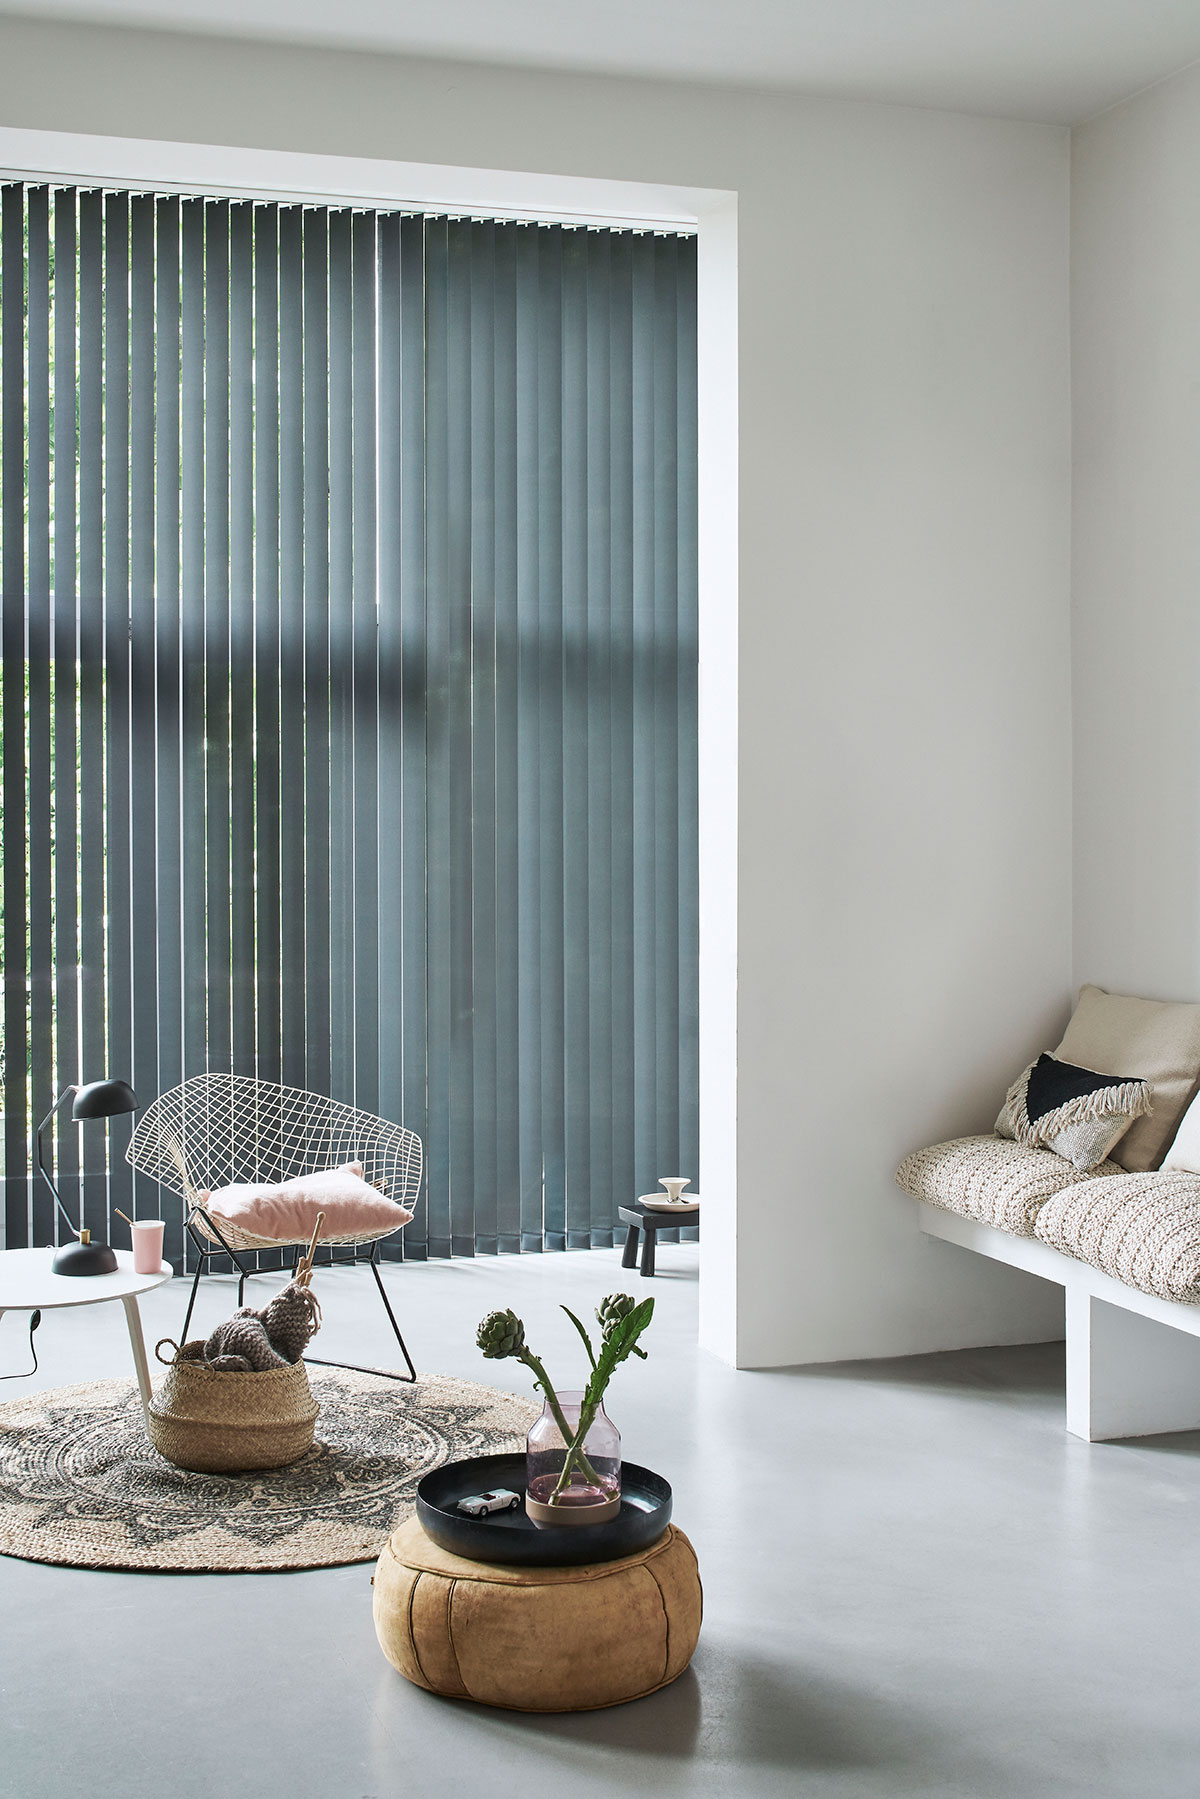 Groenevelt Zonwering & Raamdecoratie - lamellen